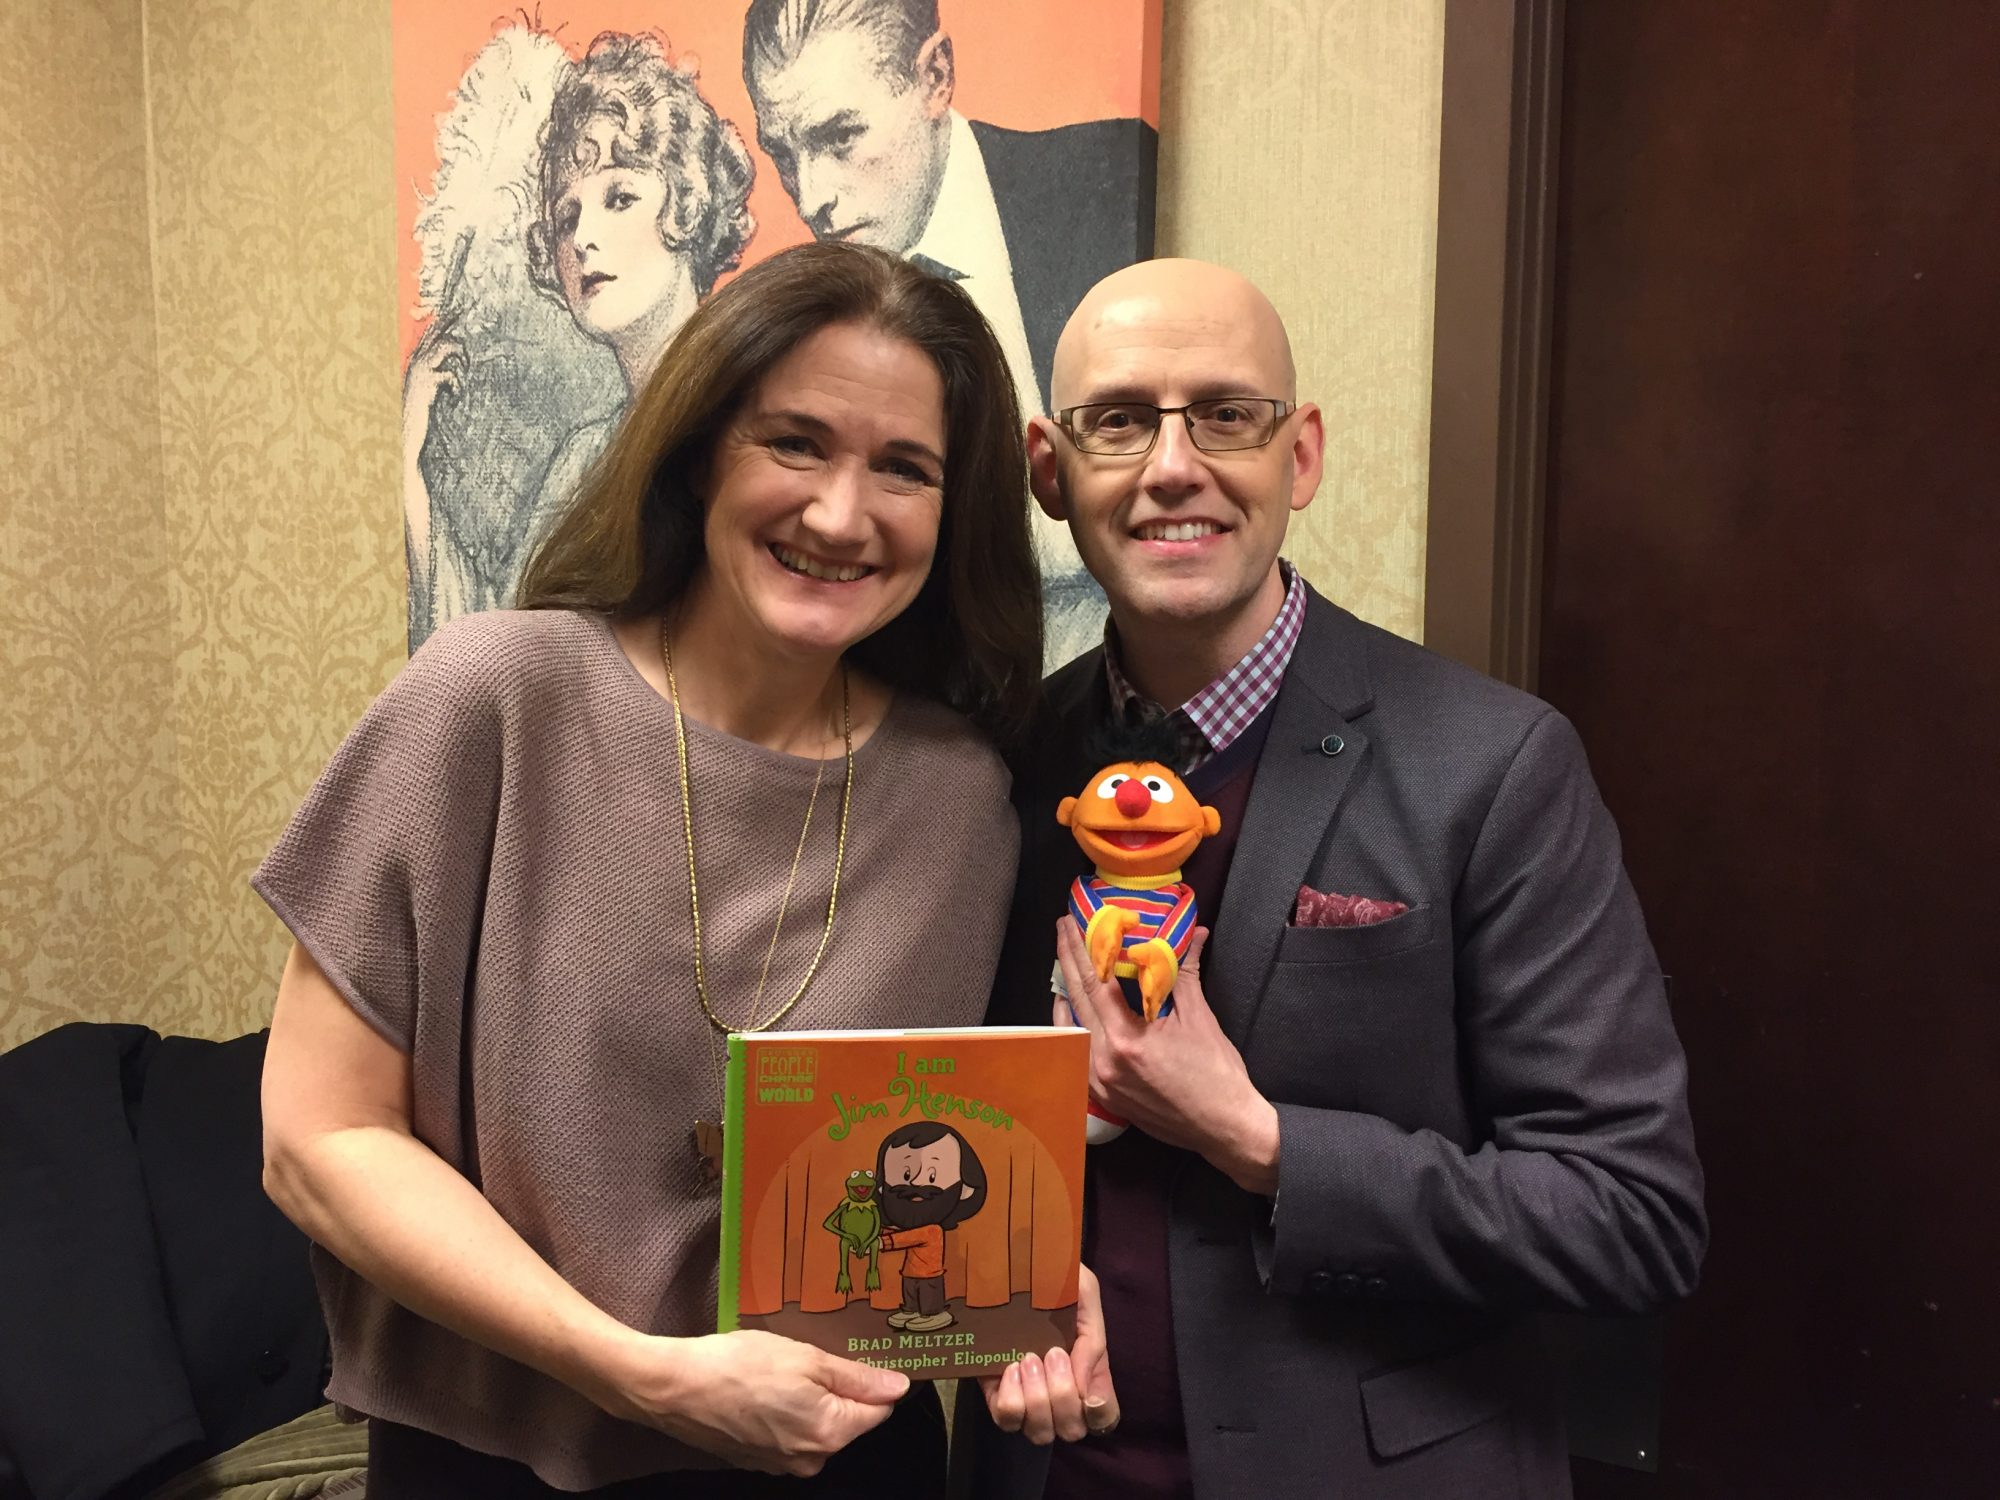 Cheryl Henson and Brad Meltzer